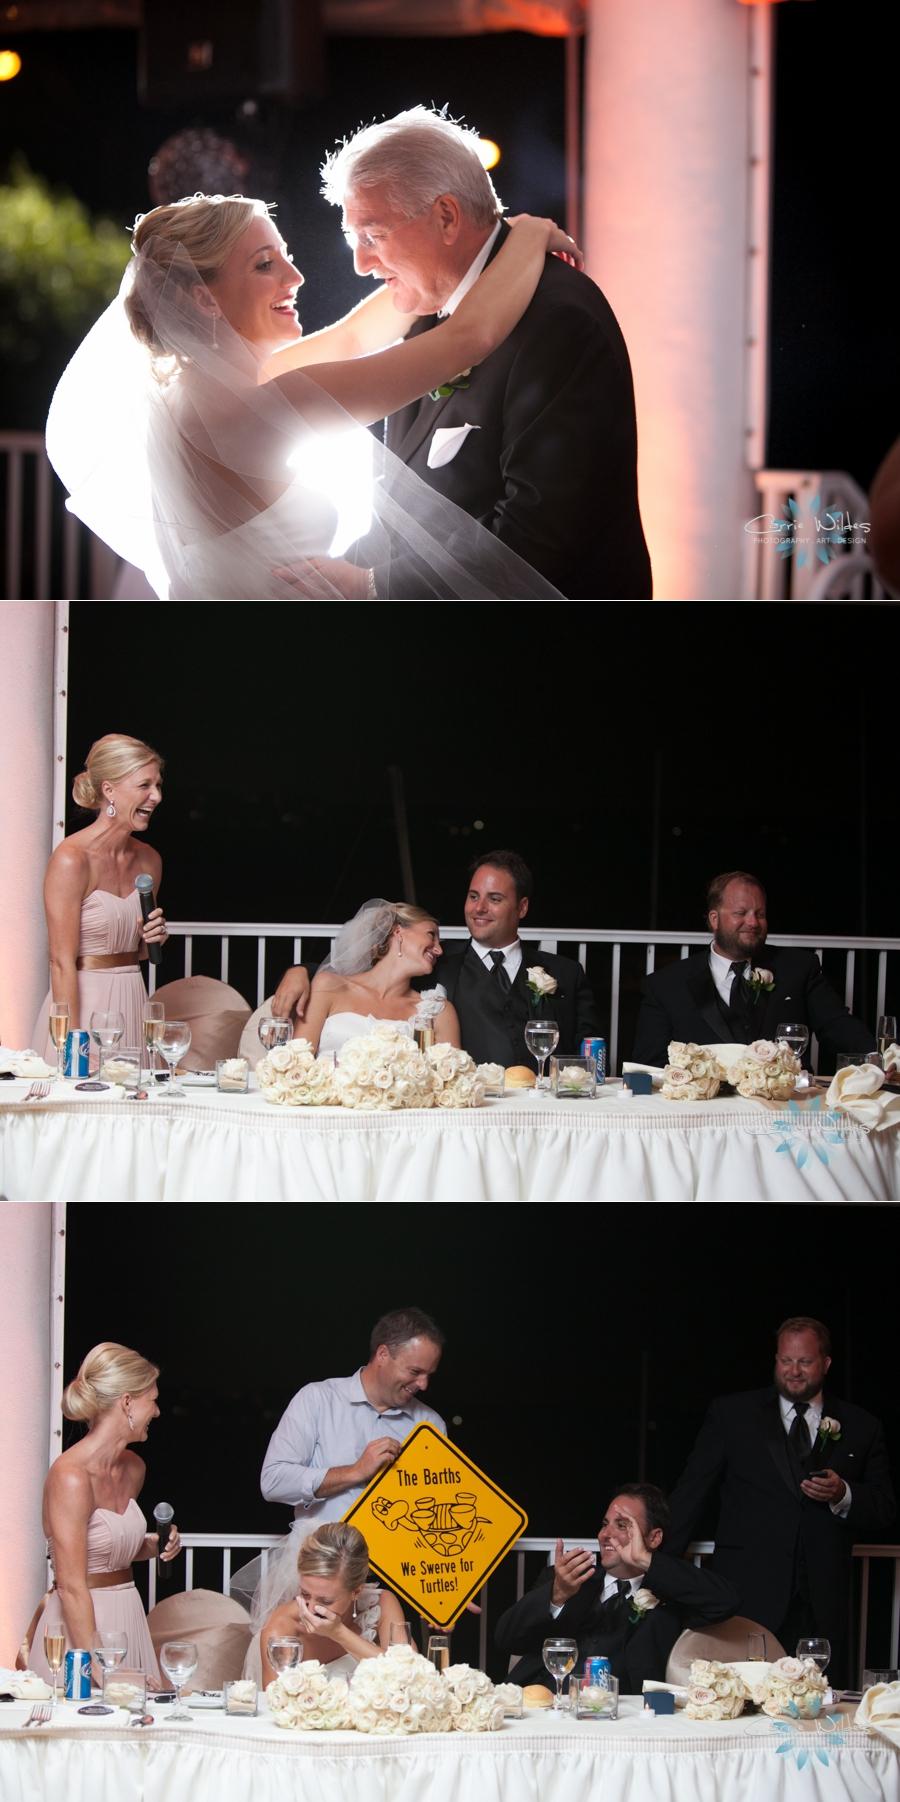 11_1_13 Clearwater Sailing Center Wedding_0019.jpg